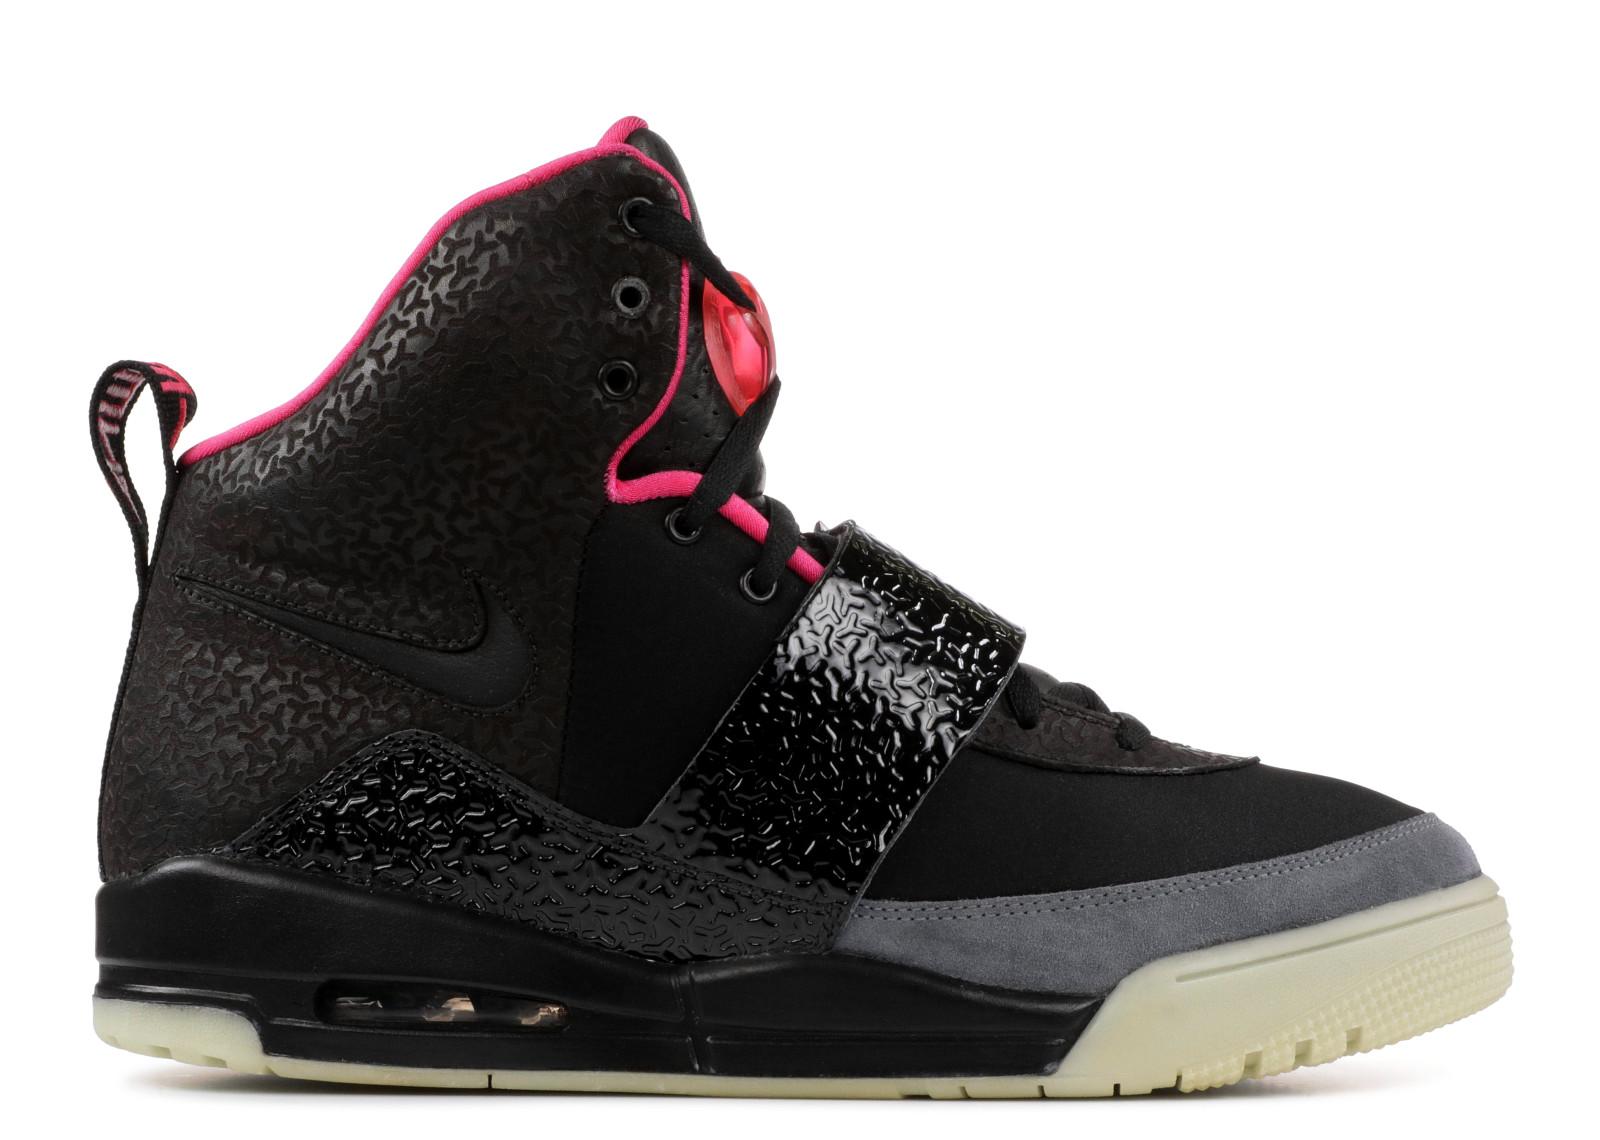 sports shoes ddd8d 2eea6 6. Nike Air Yeezy Blink, Fight Club, 6000$ - Verdict.ro